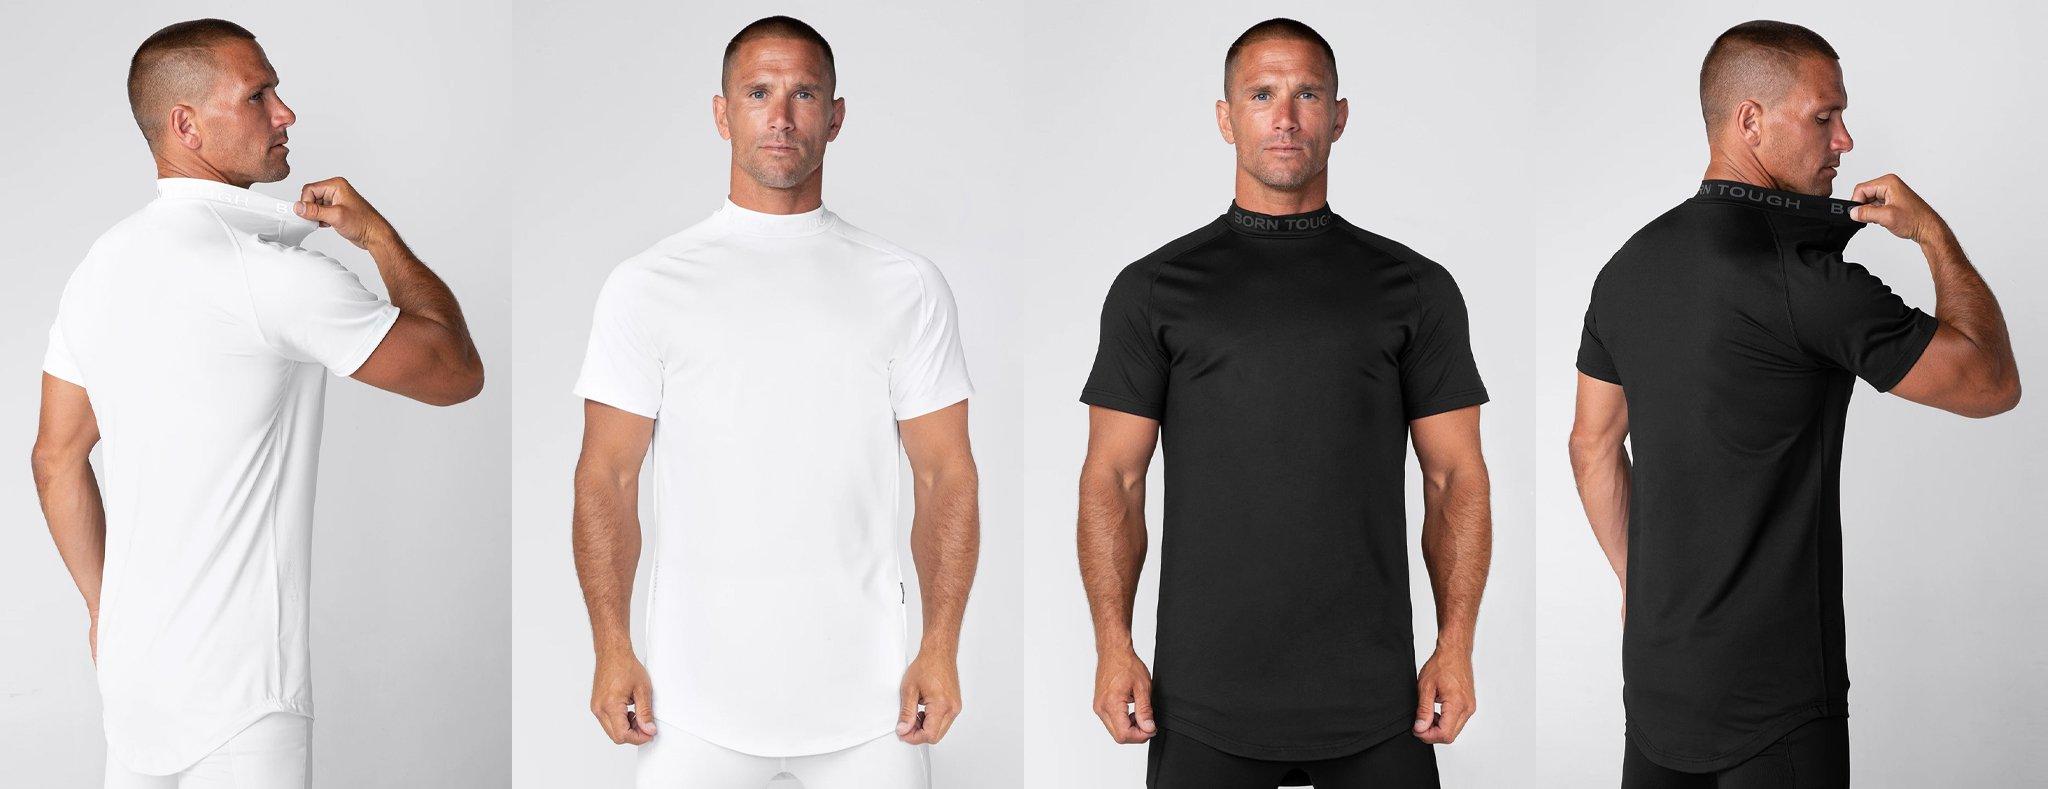 Born Tough Mock Neck Short Sleeve Compression Shirt for Men